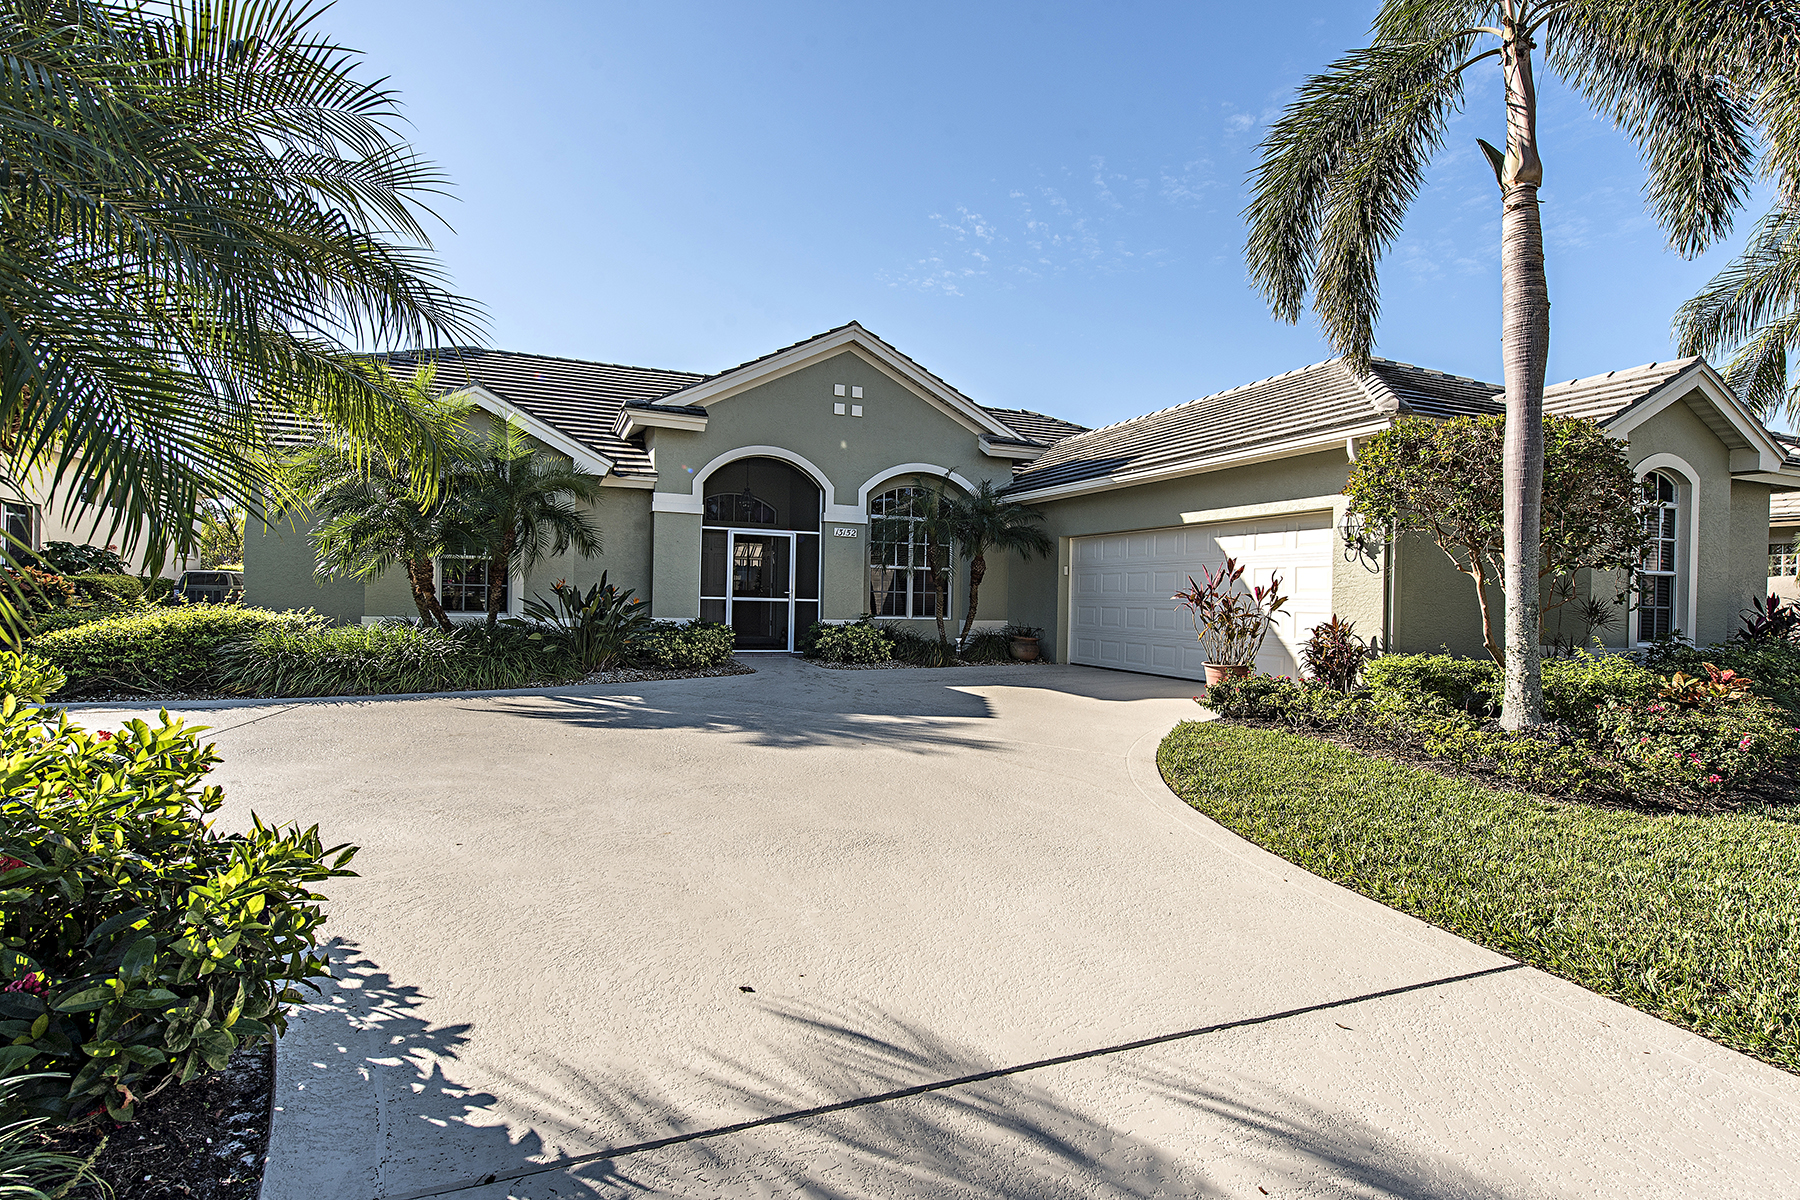 Single Family Home for Sale at WORTHINGTON 13152 Bridgeford Ave, Bonita Springs, Florida, 34135 United States